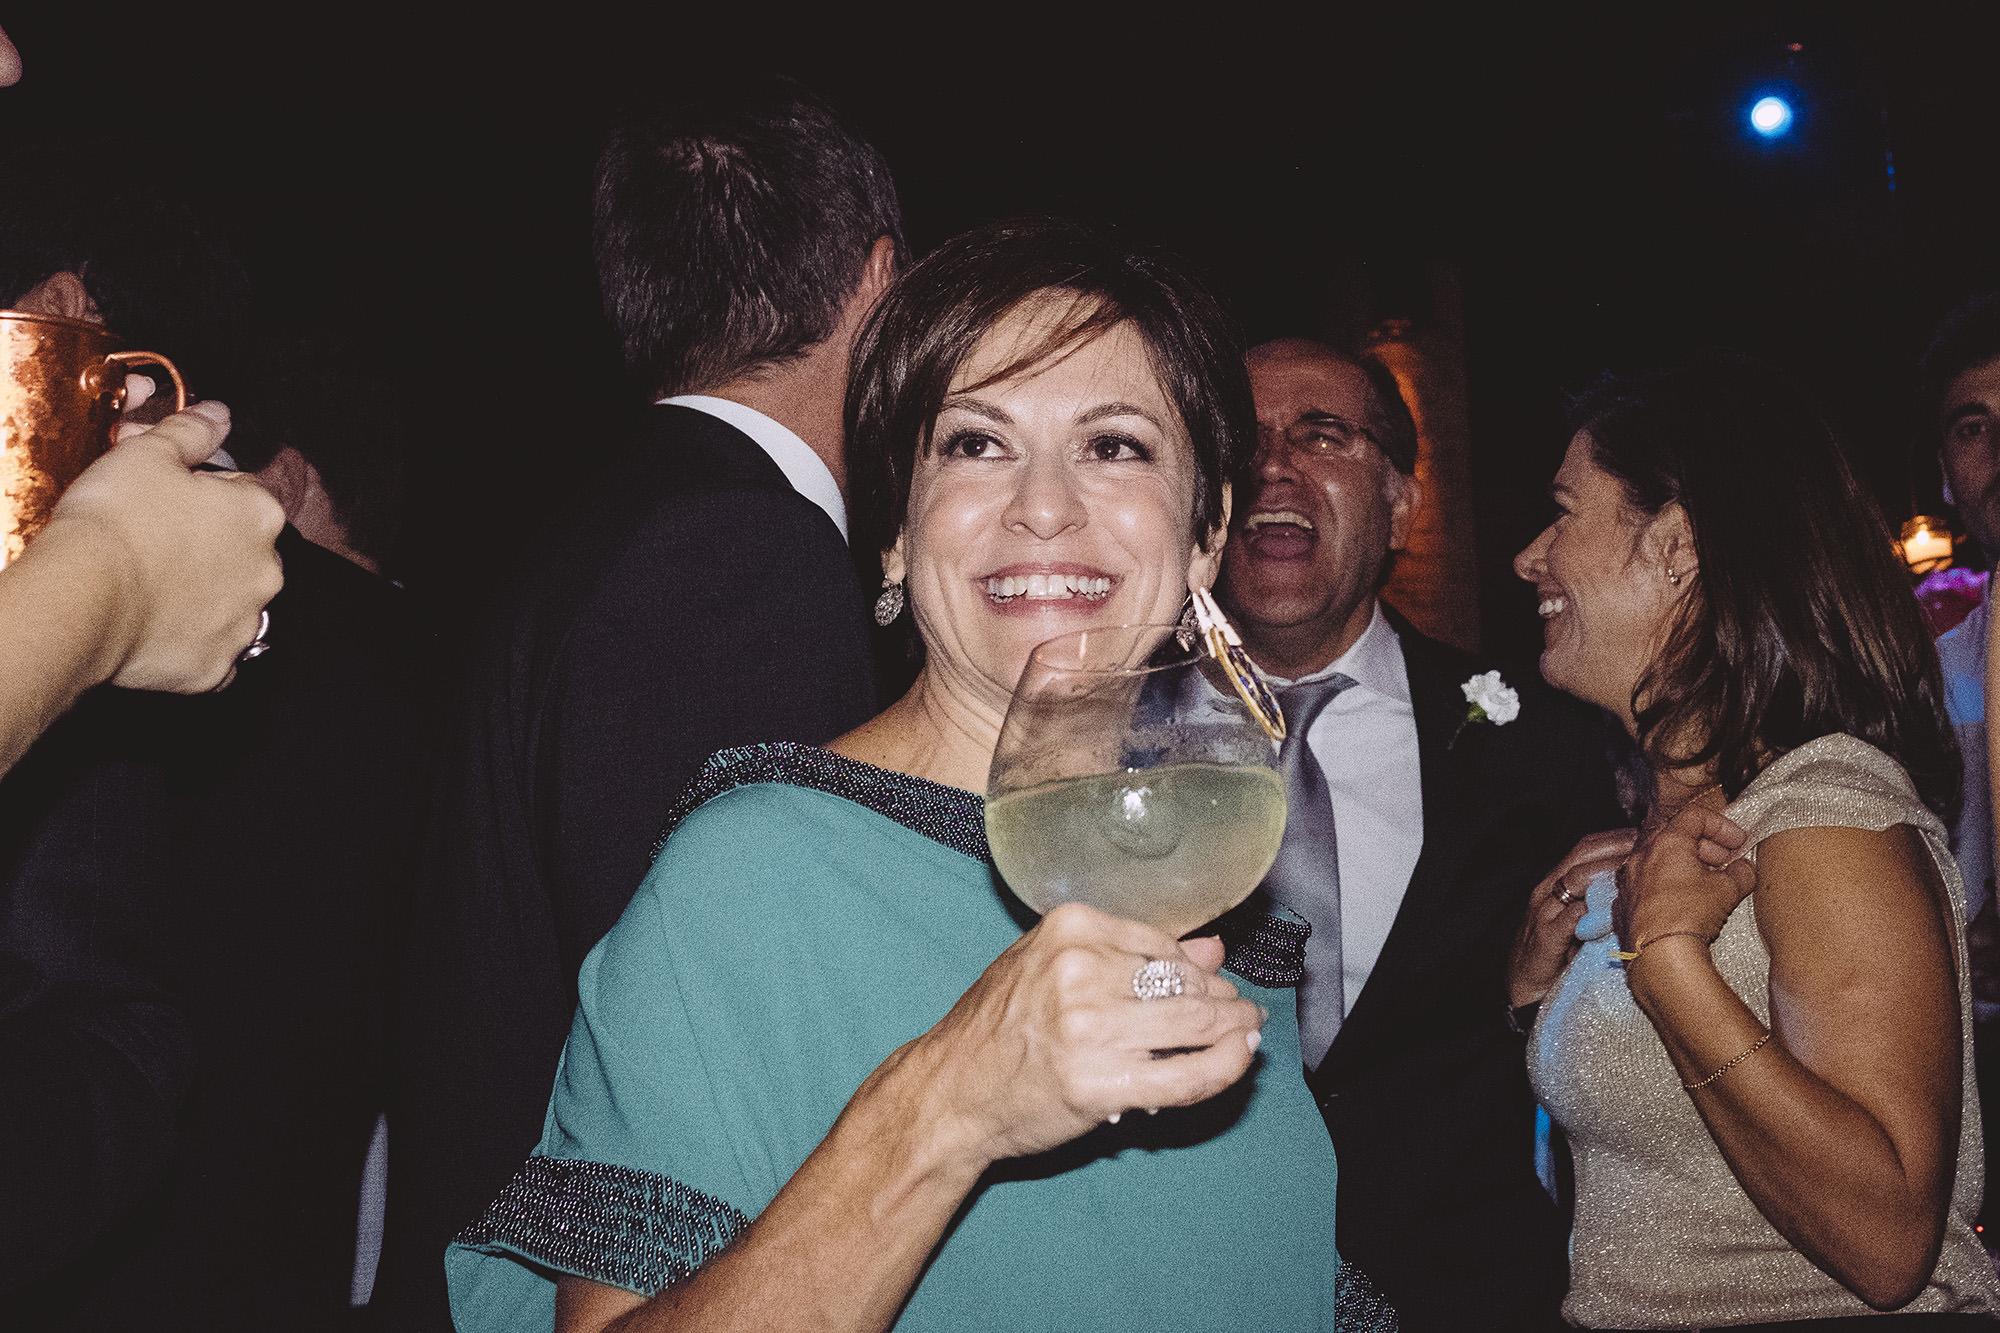 Marina e Guto - Gustavo Semeghini - 032.jpg